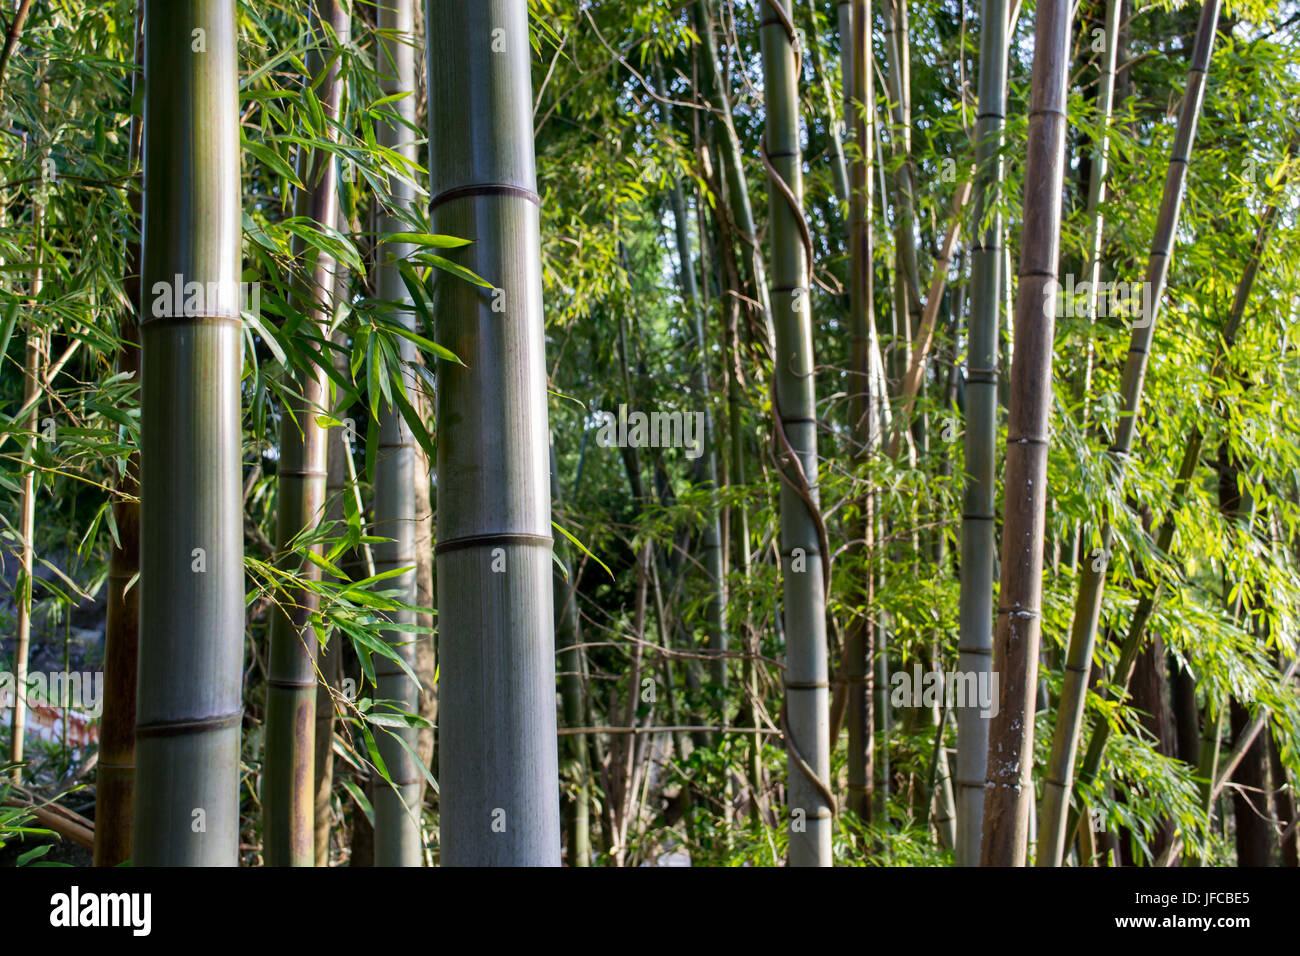 Small Bamboo forest in Hakone, Ashigarashimo District, Kanagawa Prefecture, Japan - Stock Image